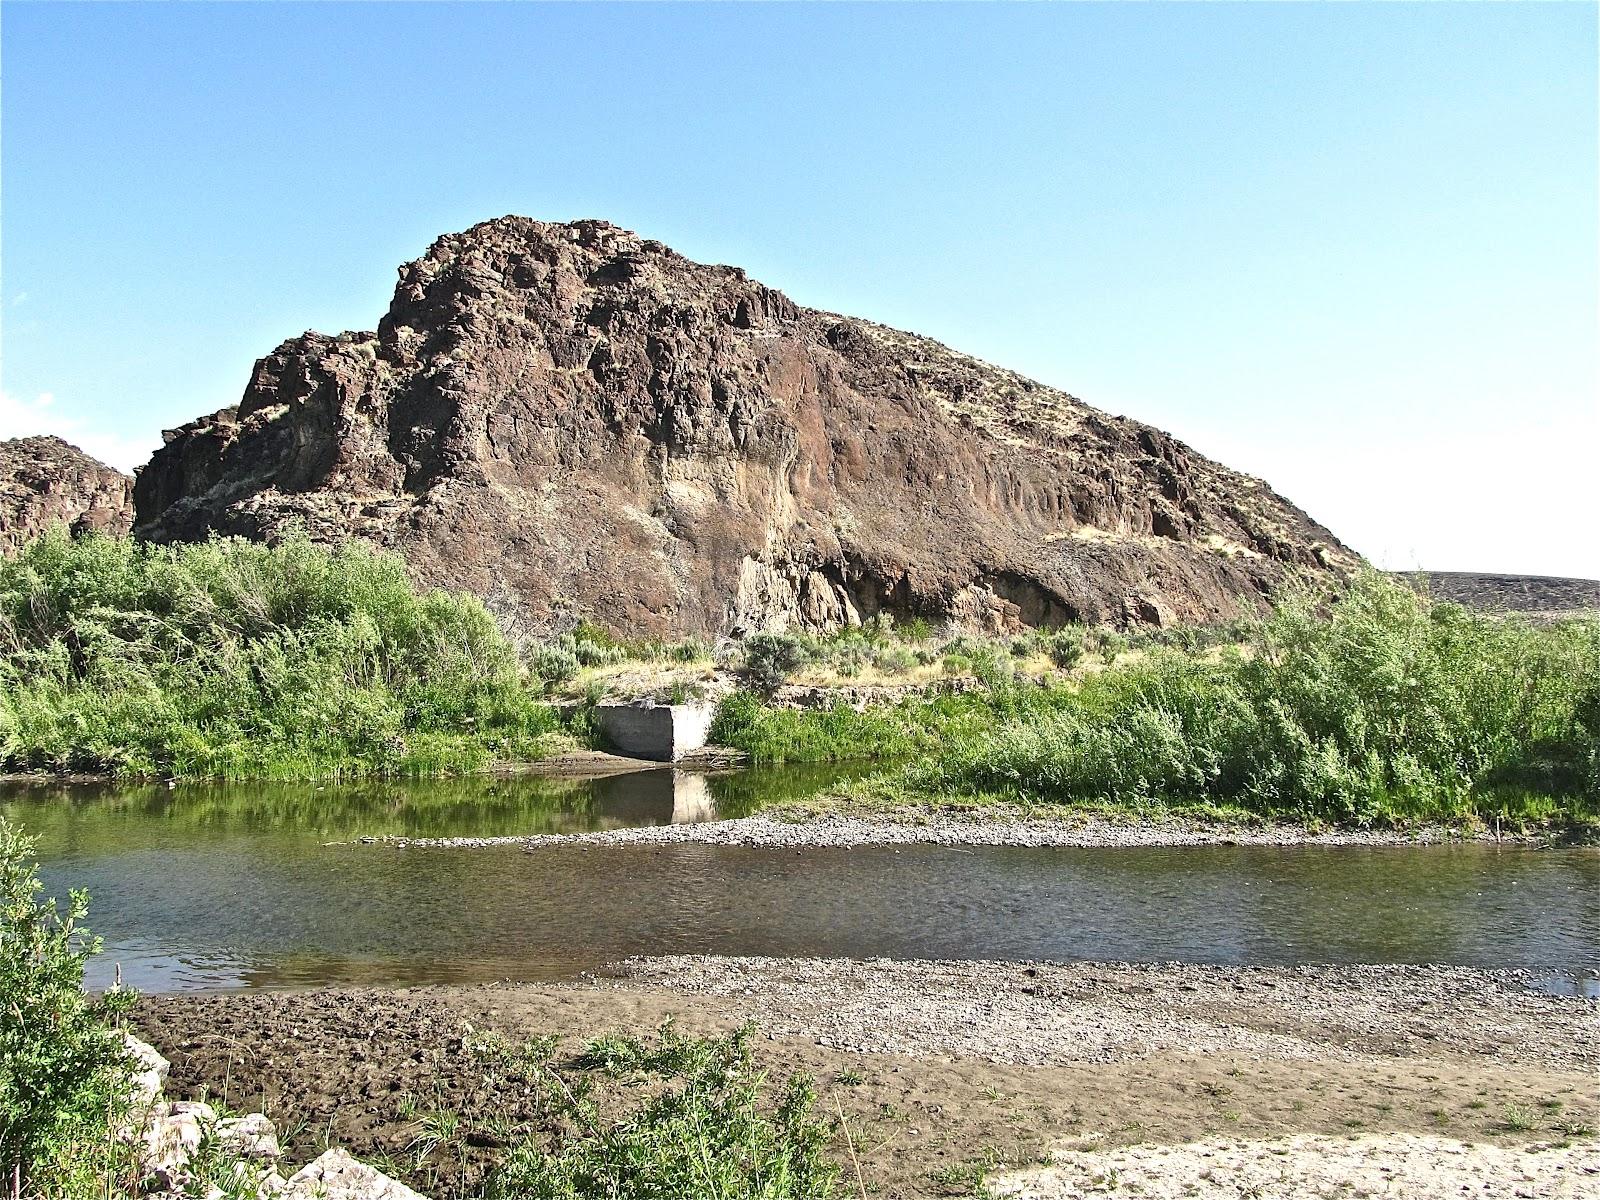 Quot Calgary Stampede Trip Quot Quot Wells Nevada To Rexburg Idaho Quot